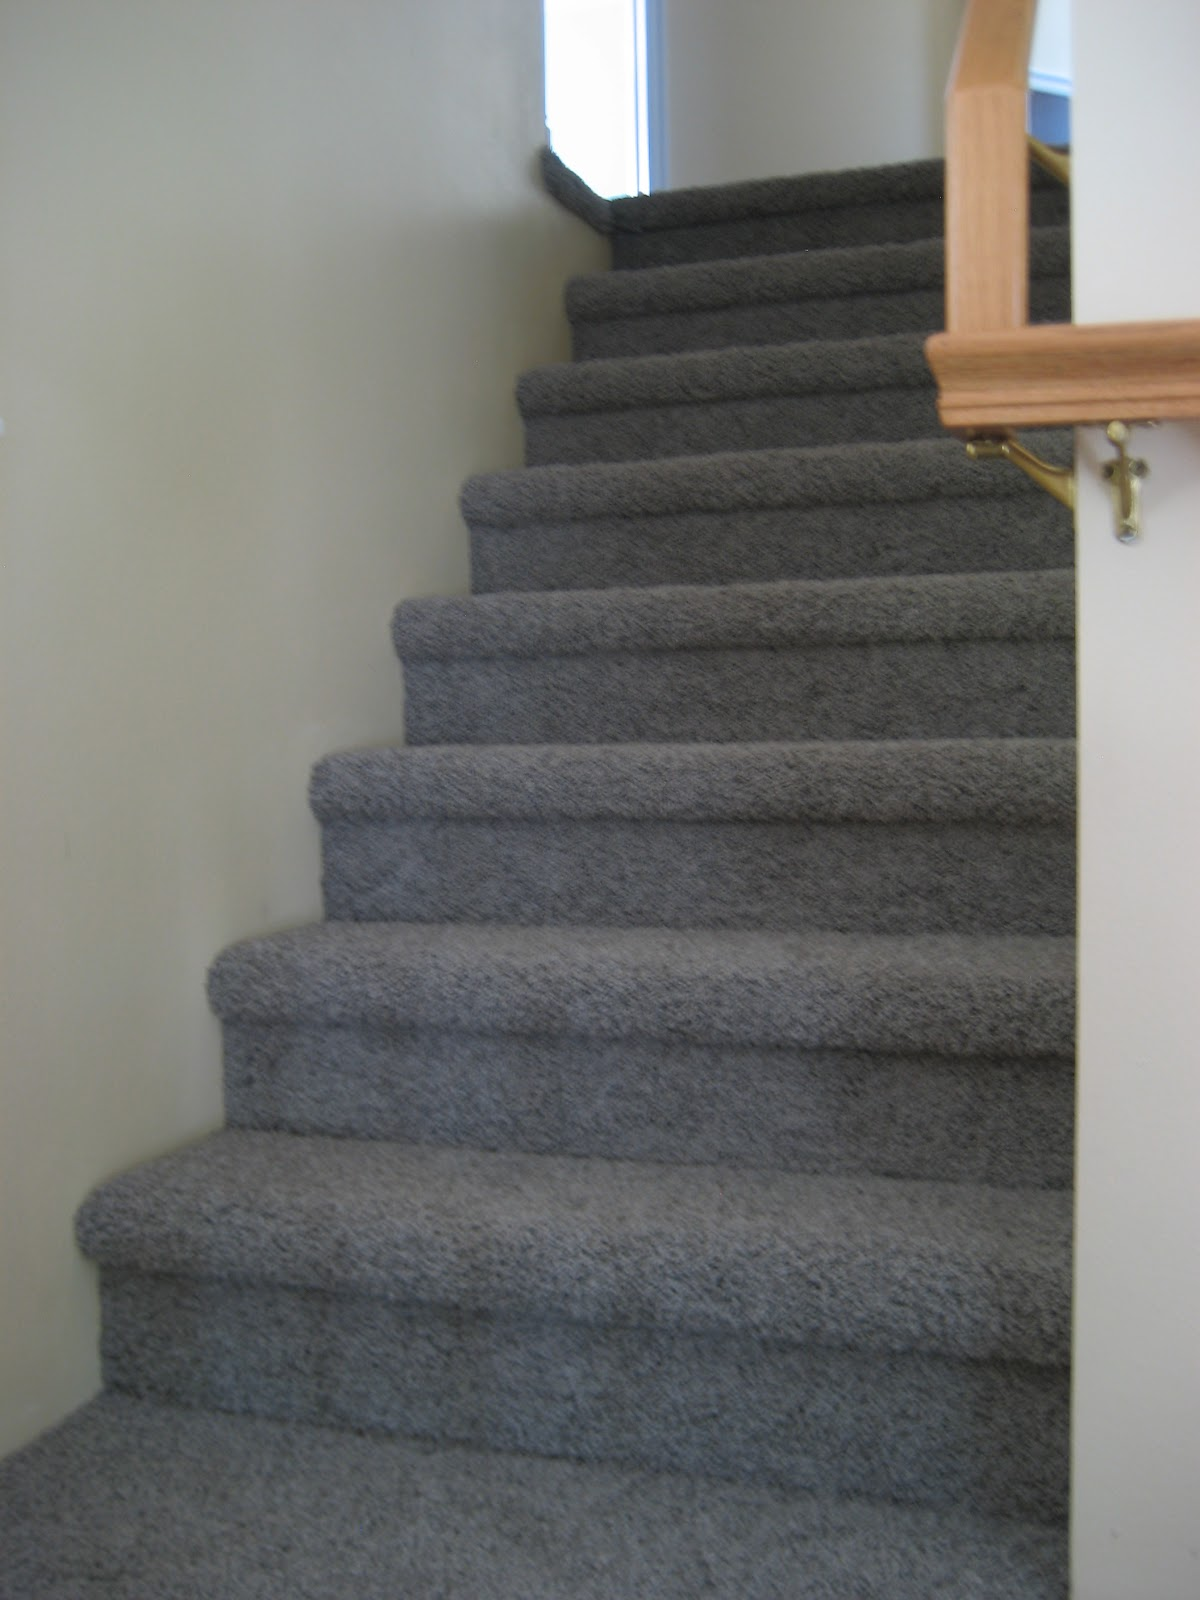 Paint Me Shabby: New carpet revealed!